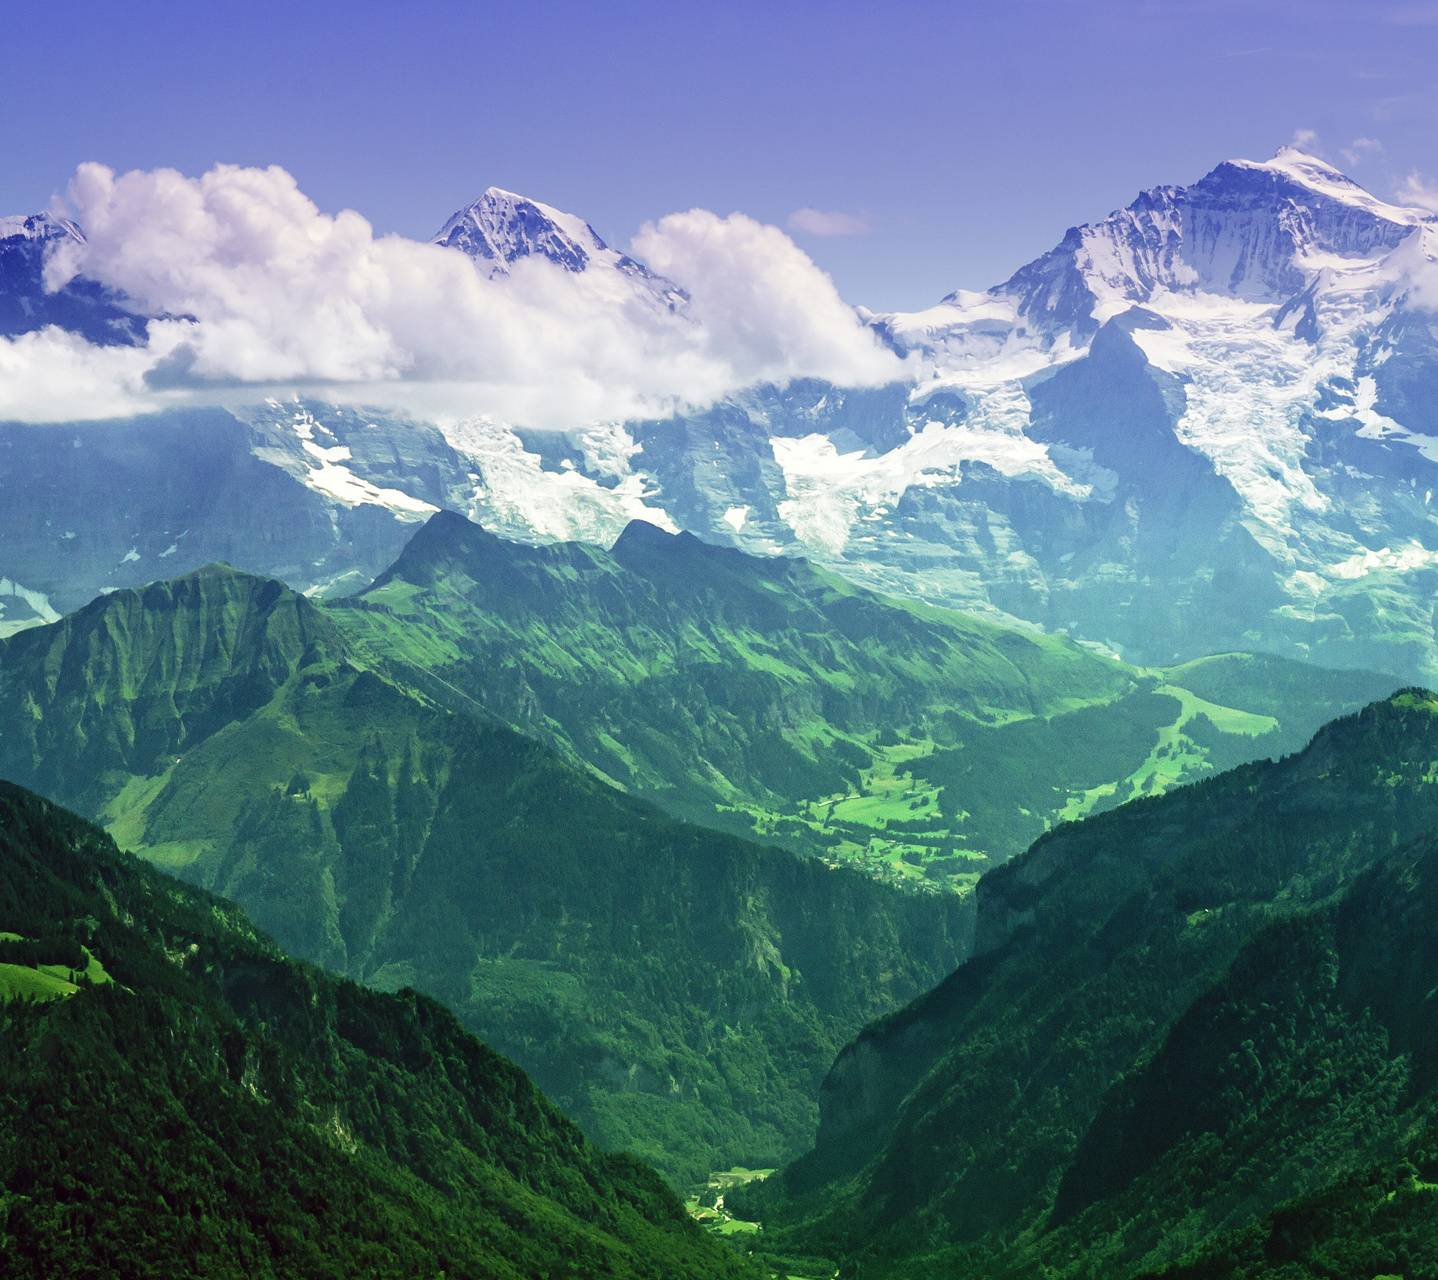 The Mighty Jungfrau